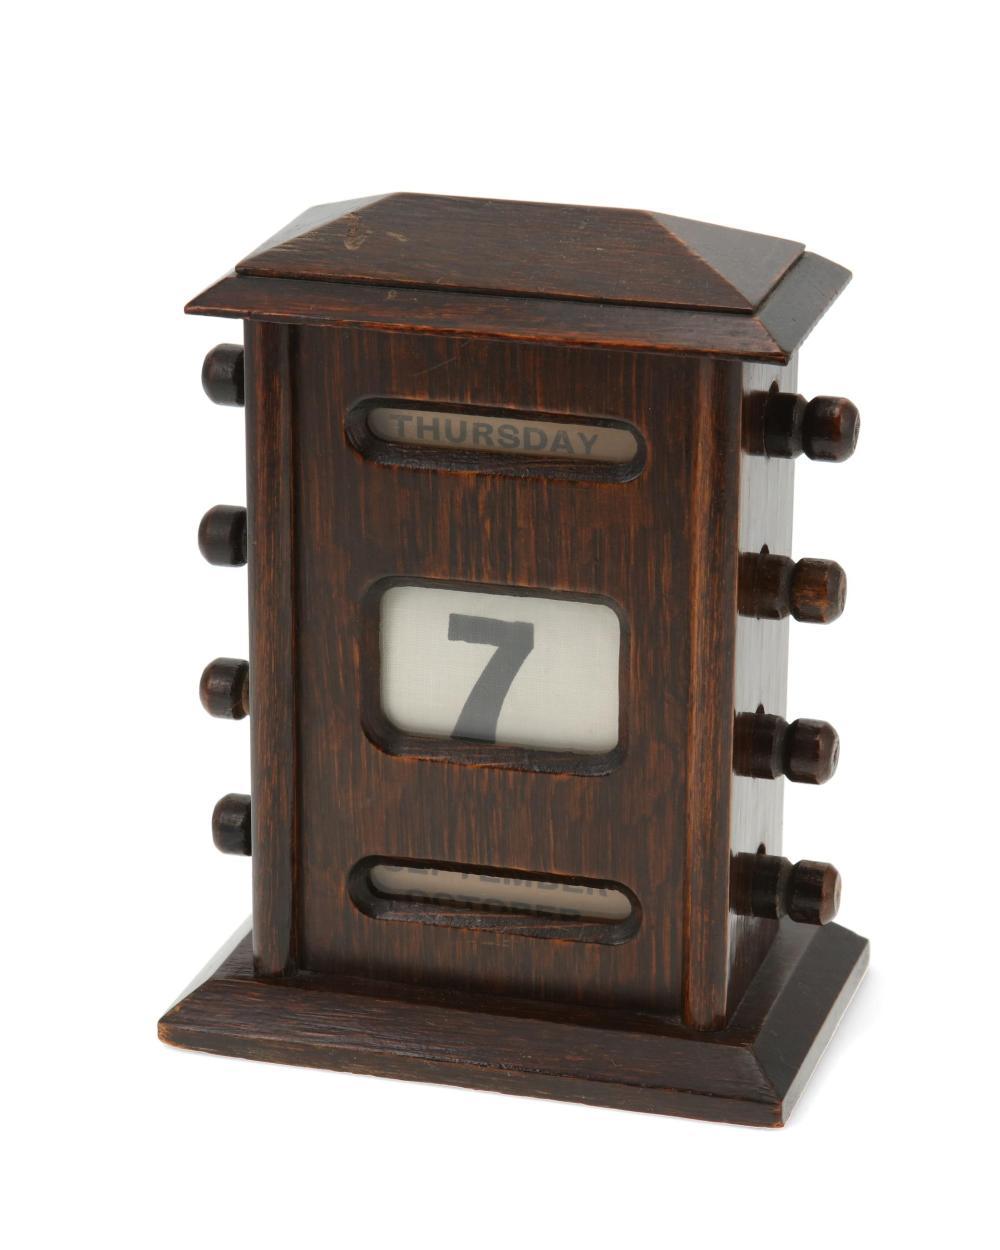 A wood perpetual desk calendar